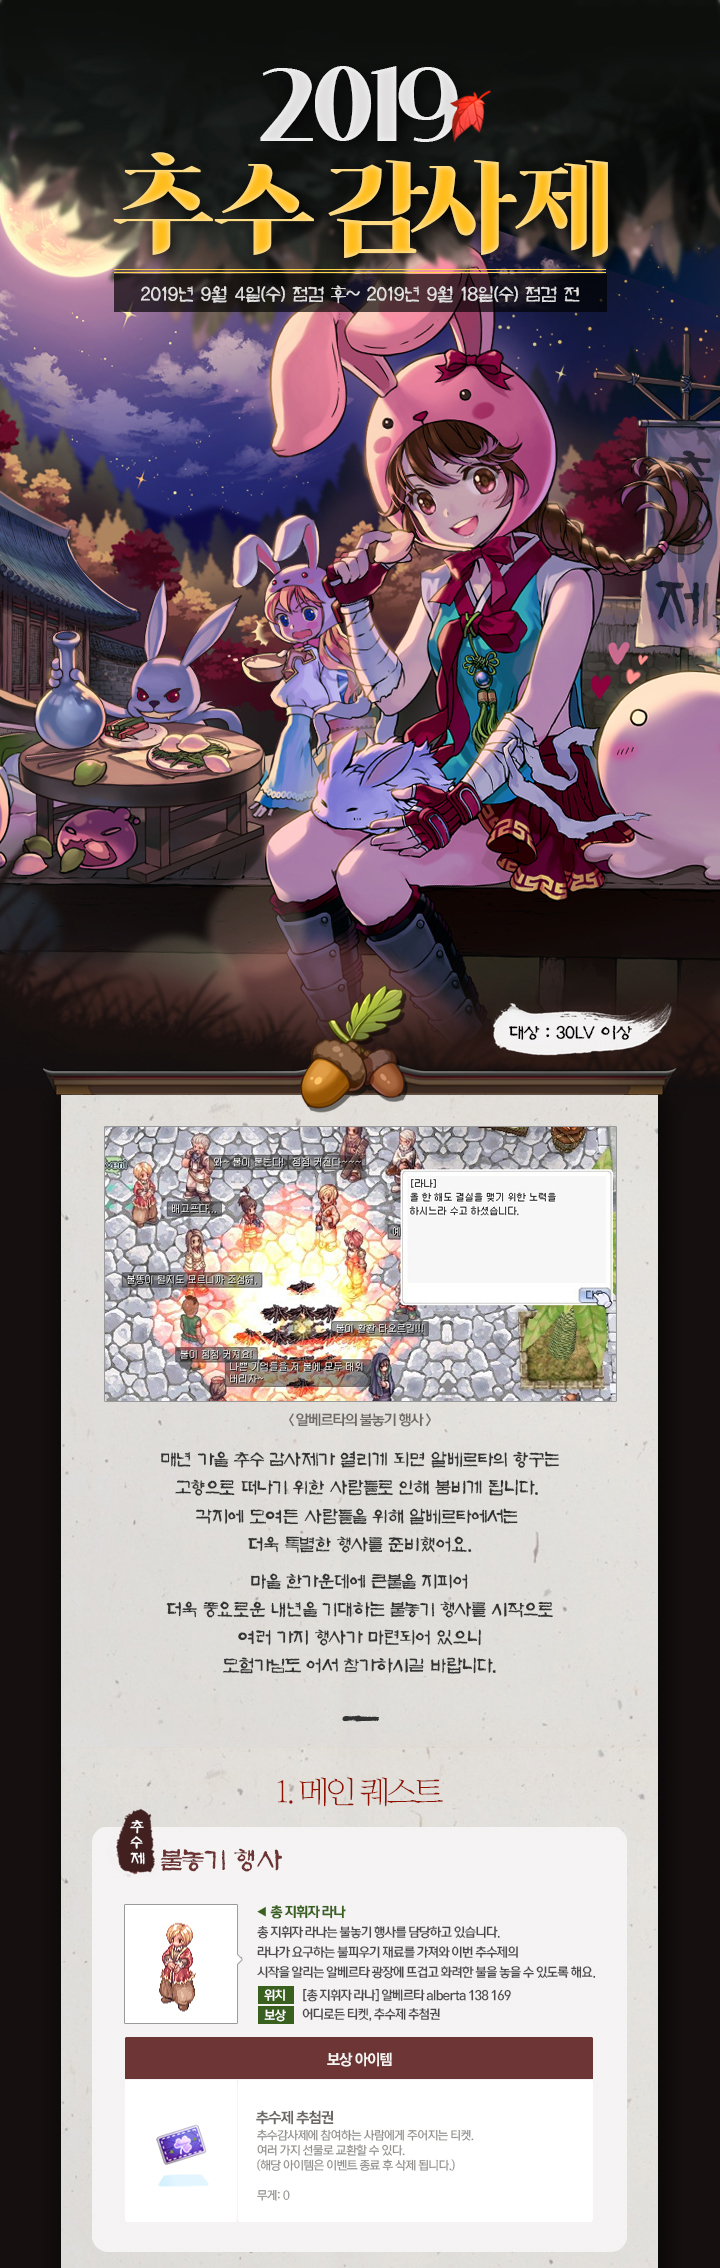 [ROZ]_추수제이벤트 image 1